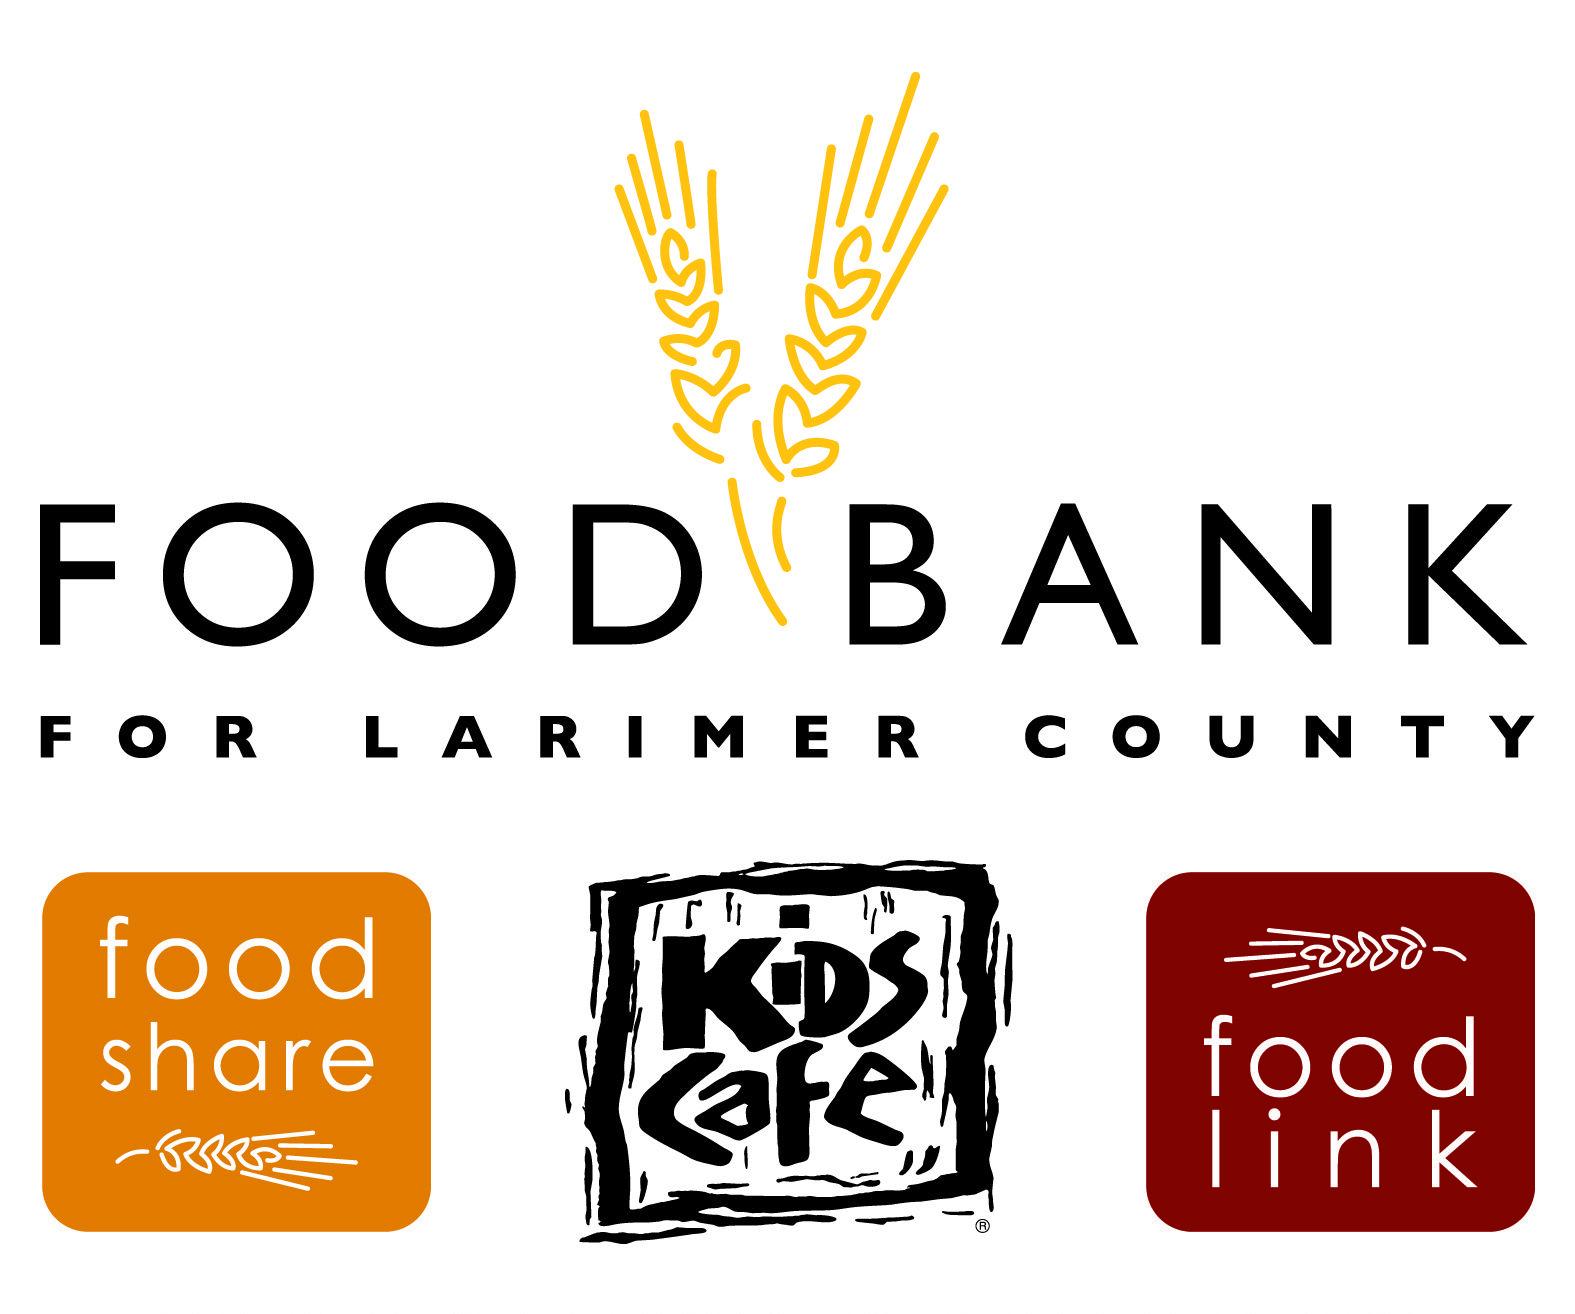 Food bank of larimer county google search food bank